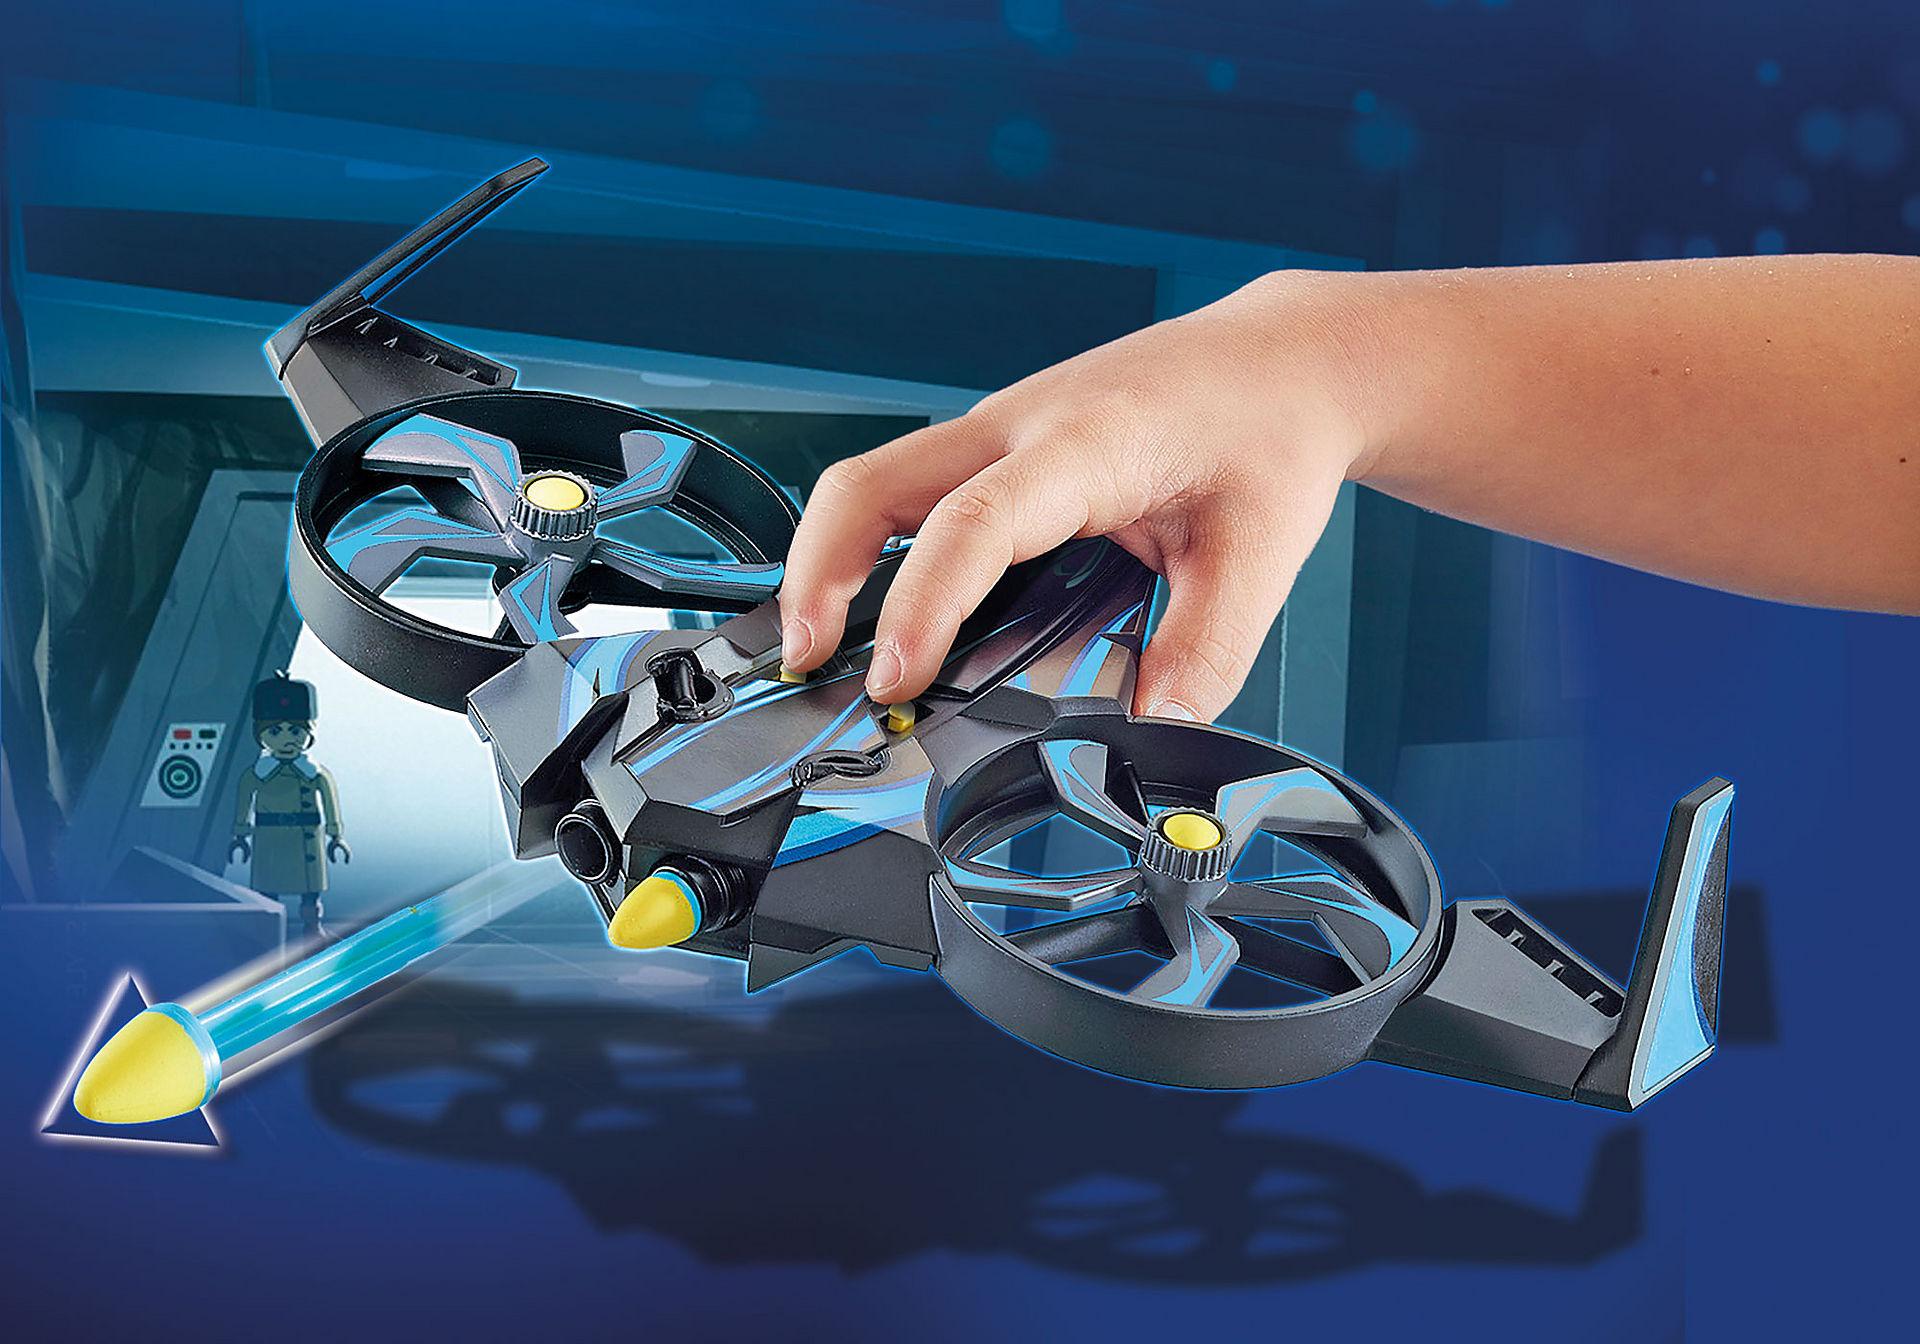 http://media.playmobil.com/i/playmobil/70071_product_extra1/PLAYMOBIL:THE MOVIE Robotitron mit Drohne